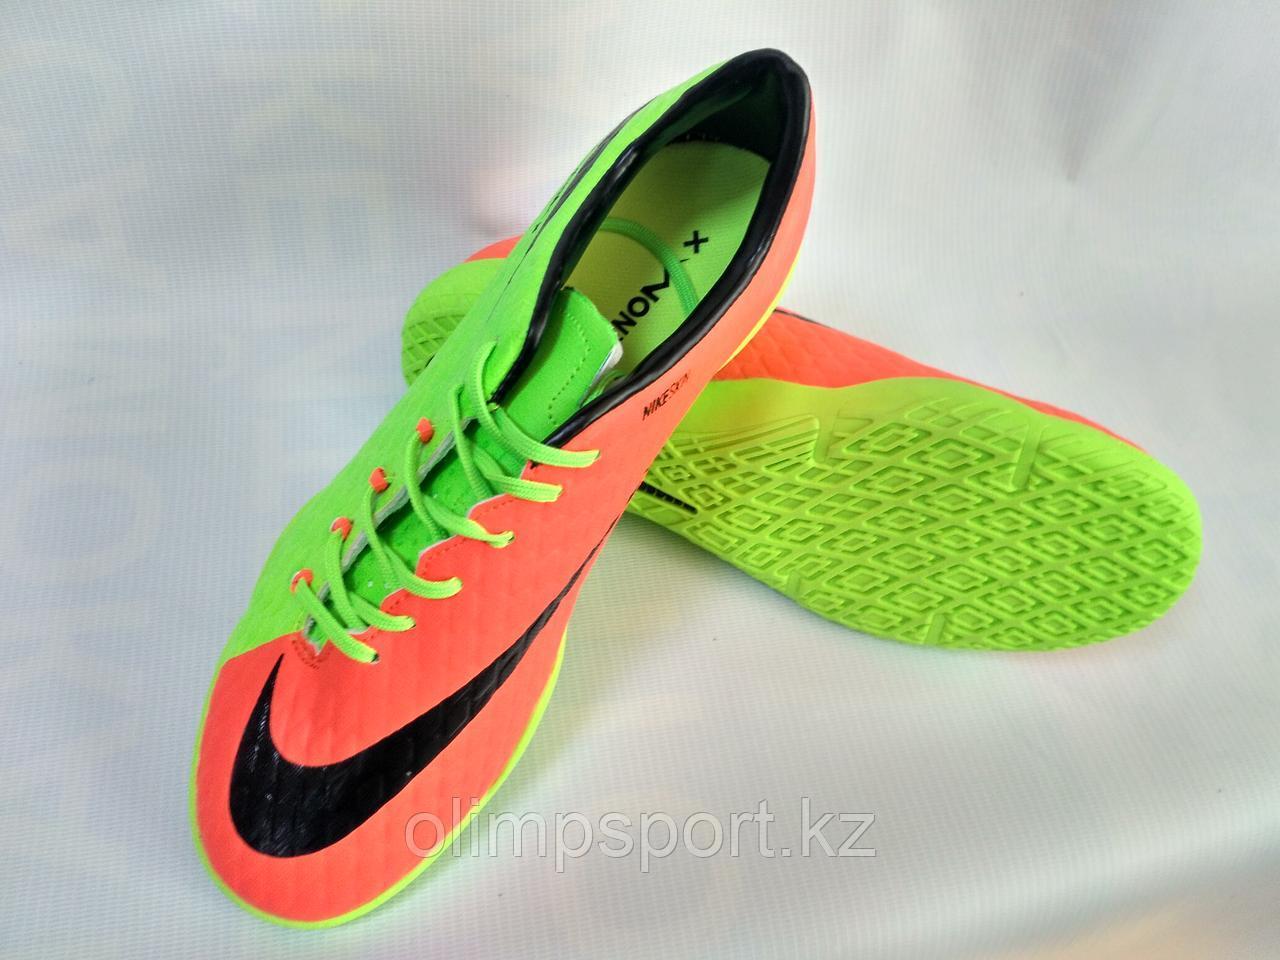 Обувь футбольная, футзалки Nike HypervenomX